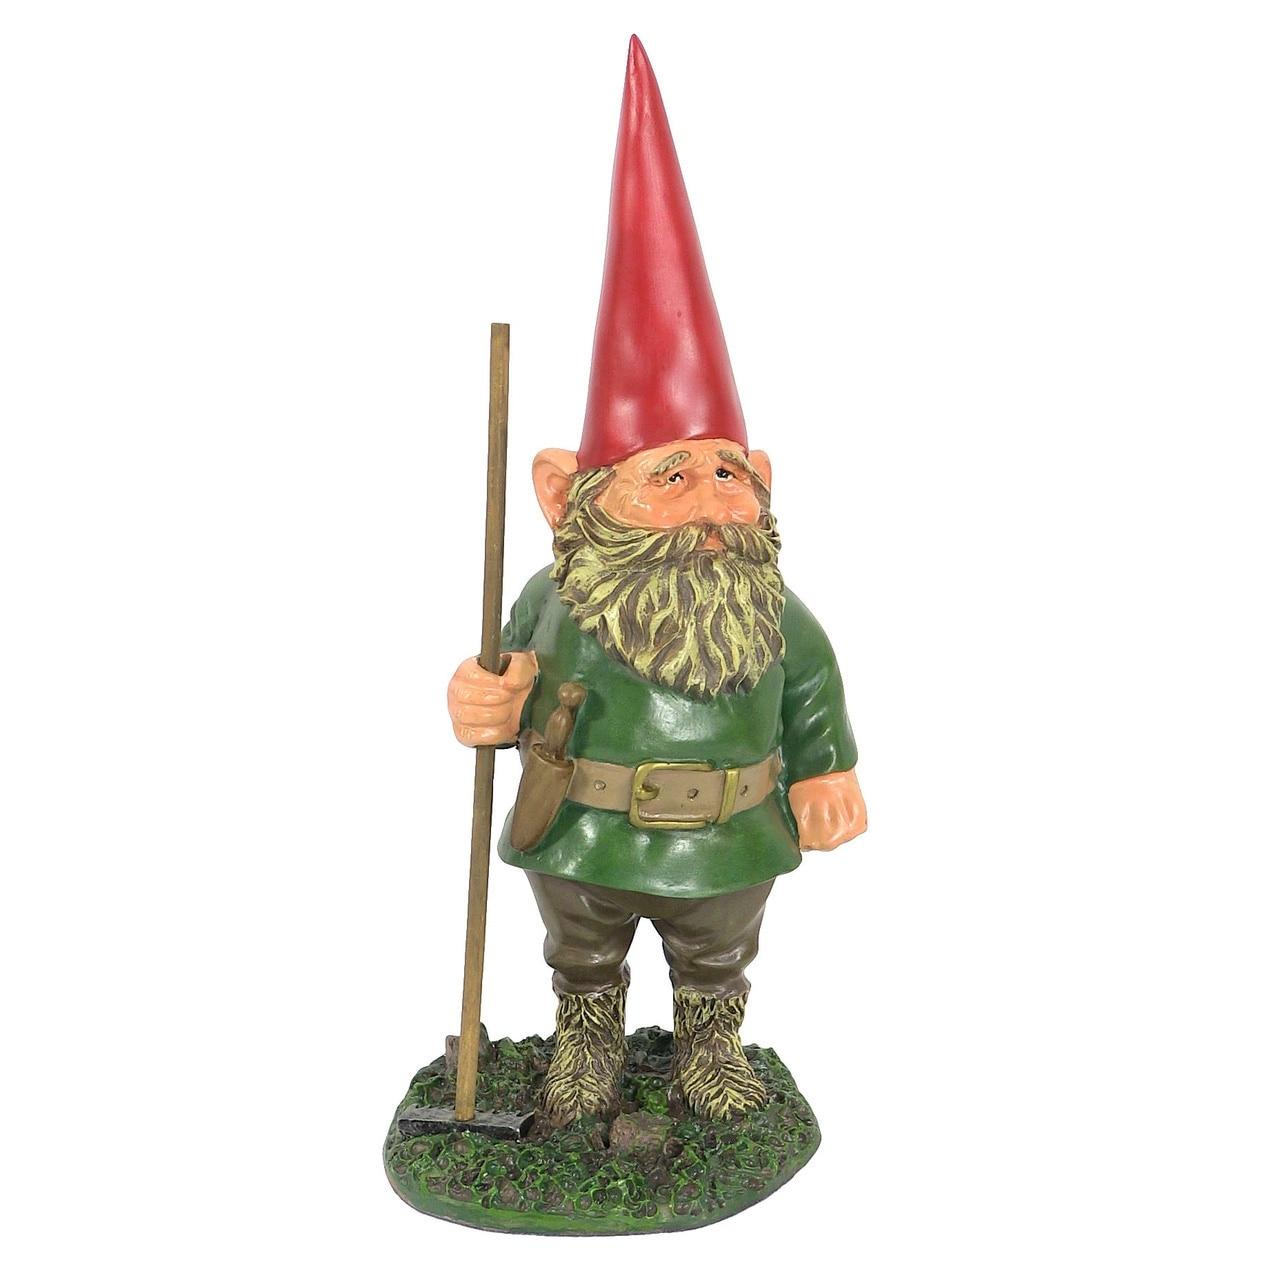 Garden Gnomes On Sale: Shop Sunnydaze Woodland Garden Gnomes